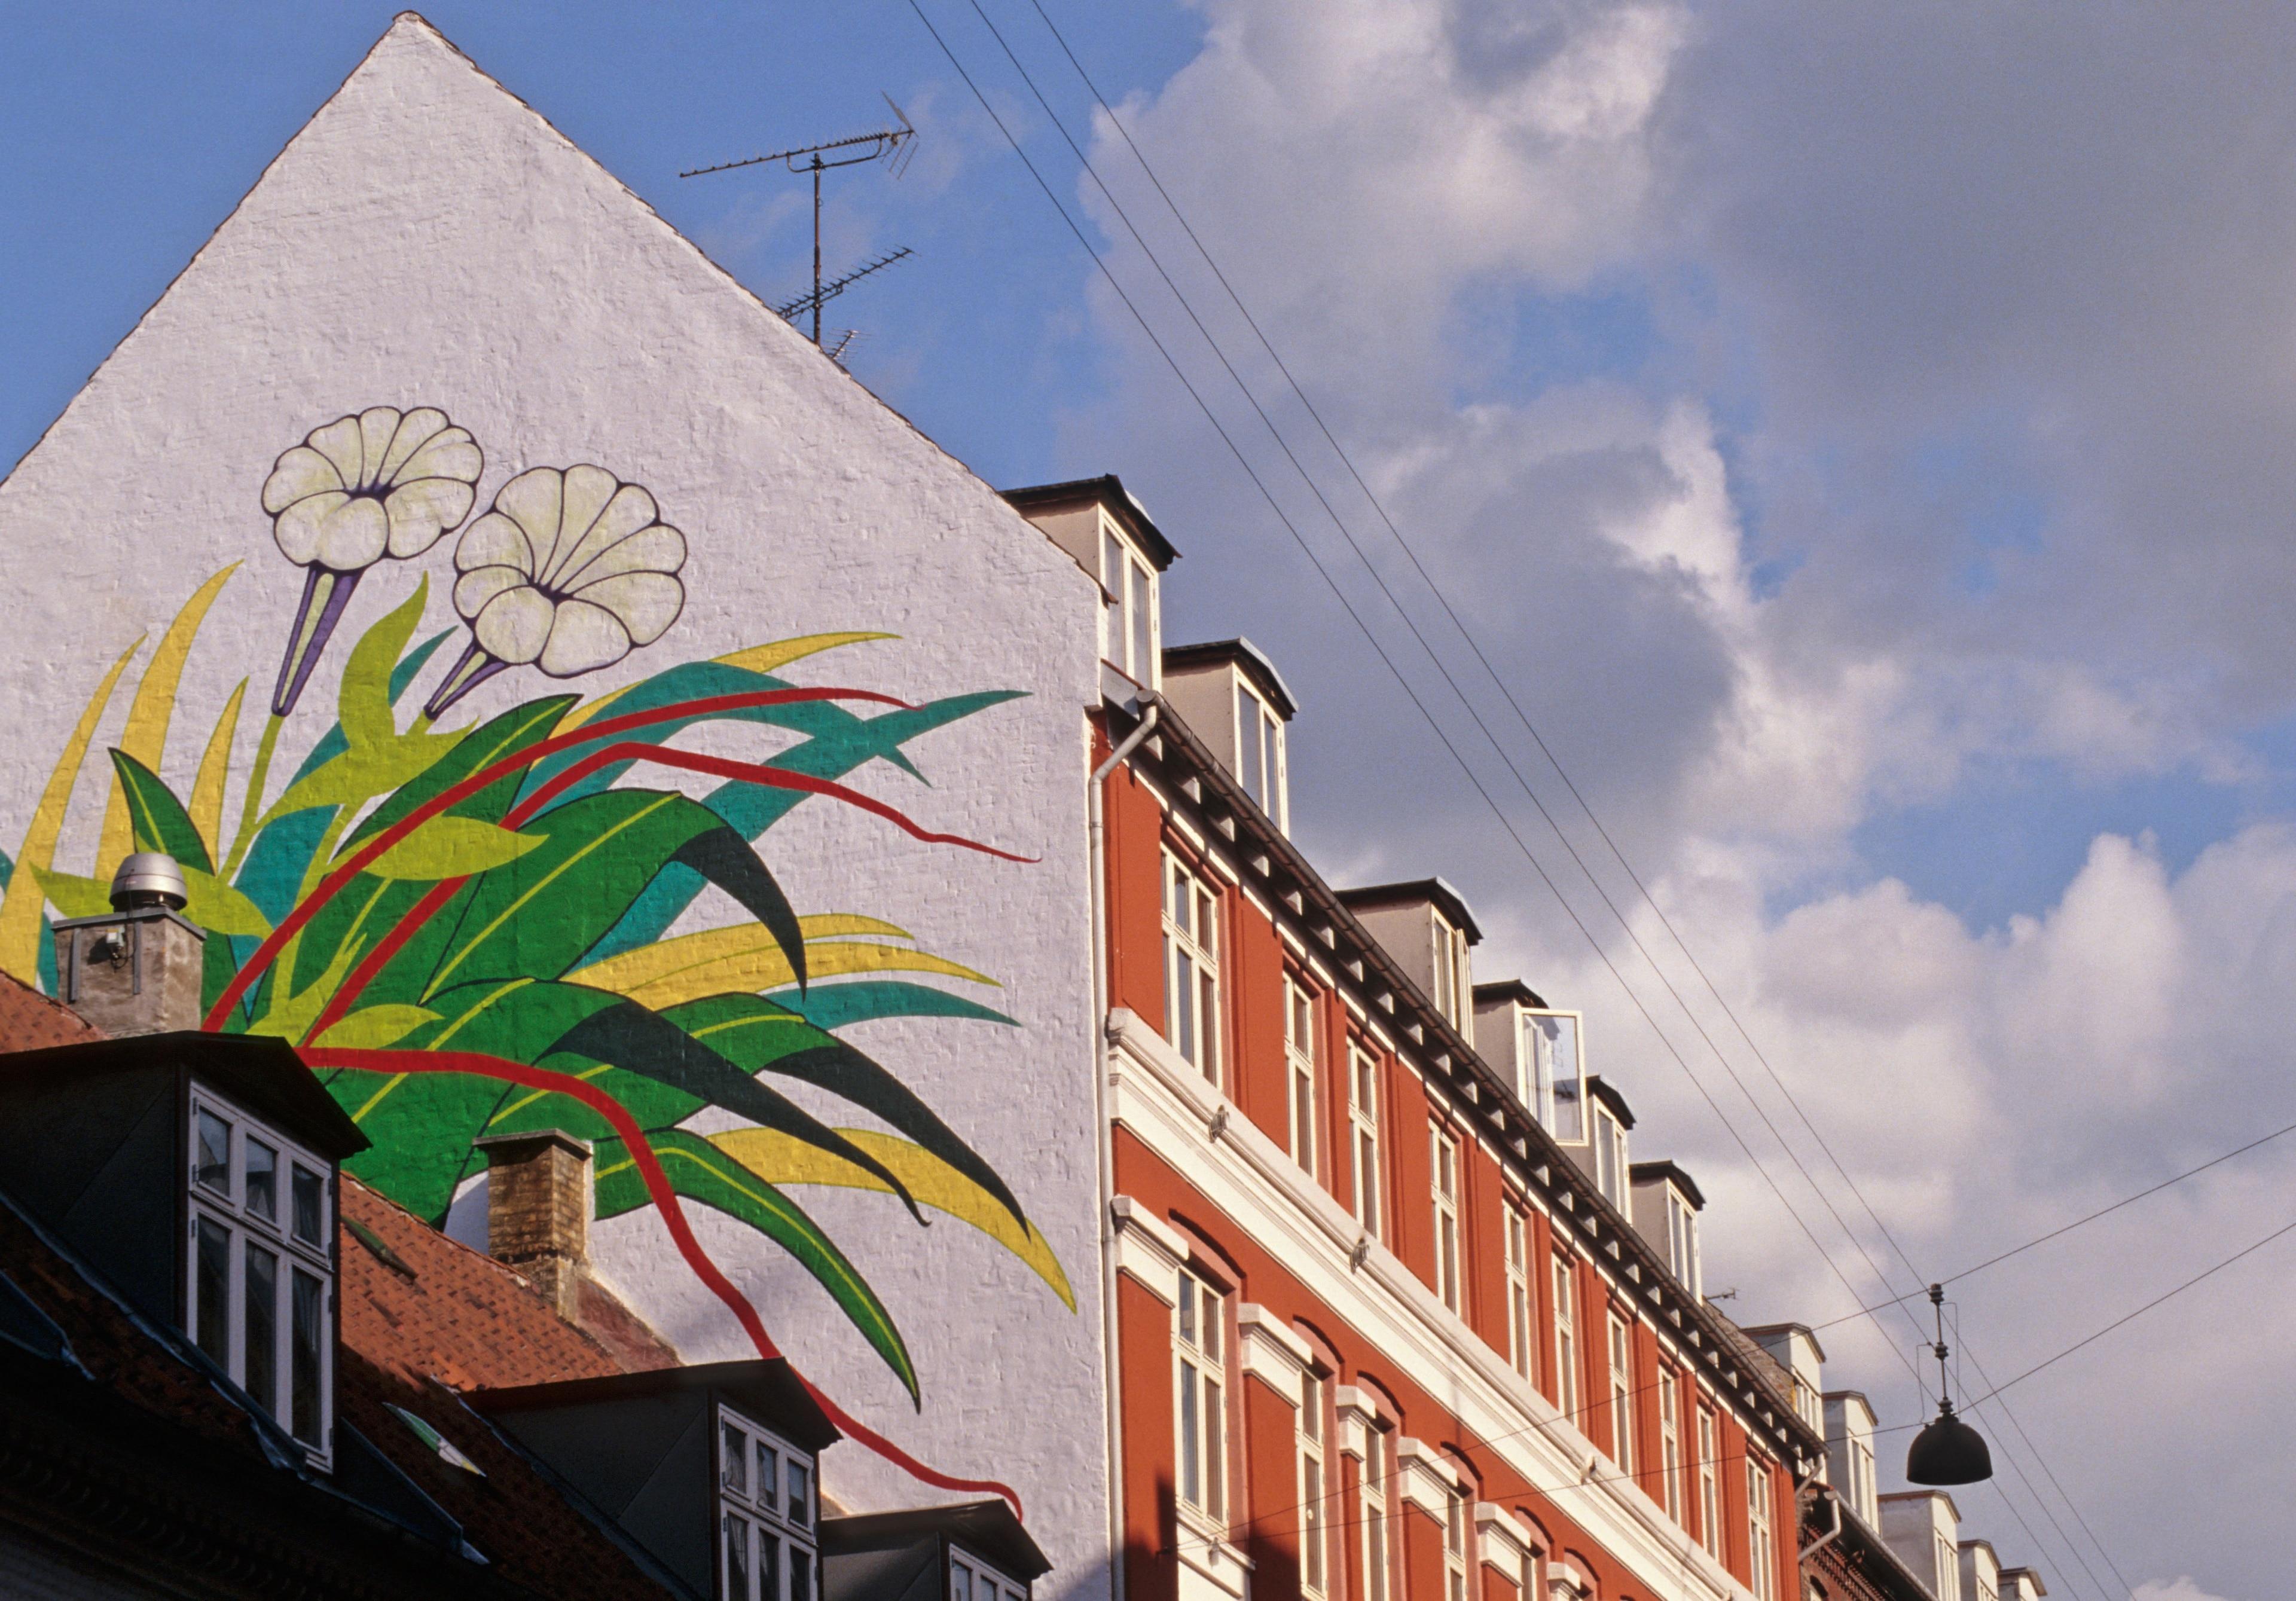 Norrebro, Copenhagen, Hovedstaden, Denmark